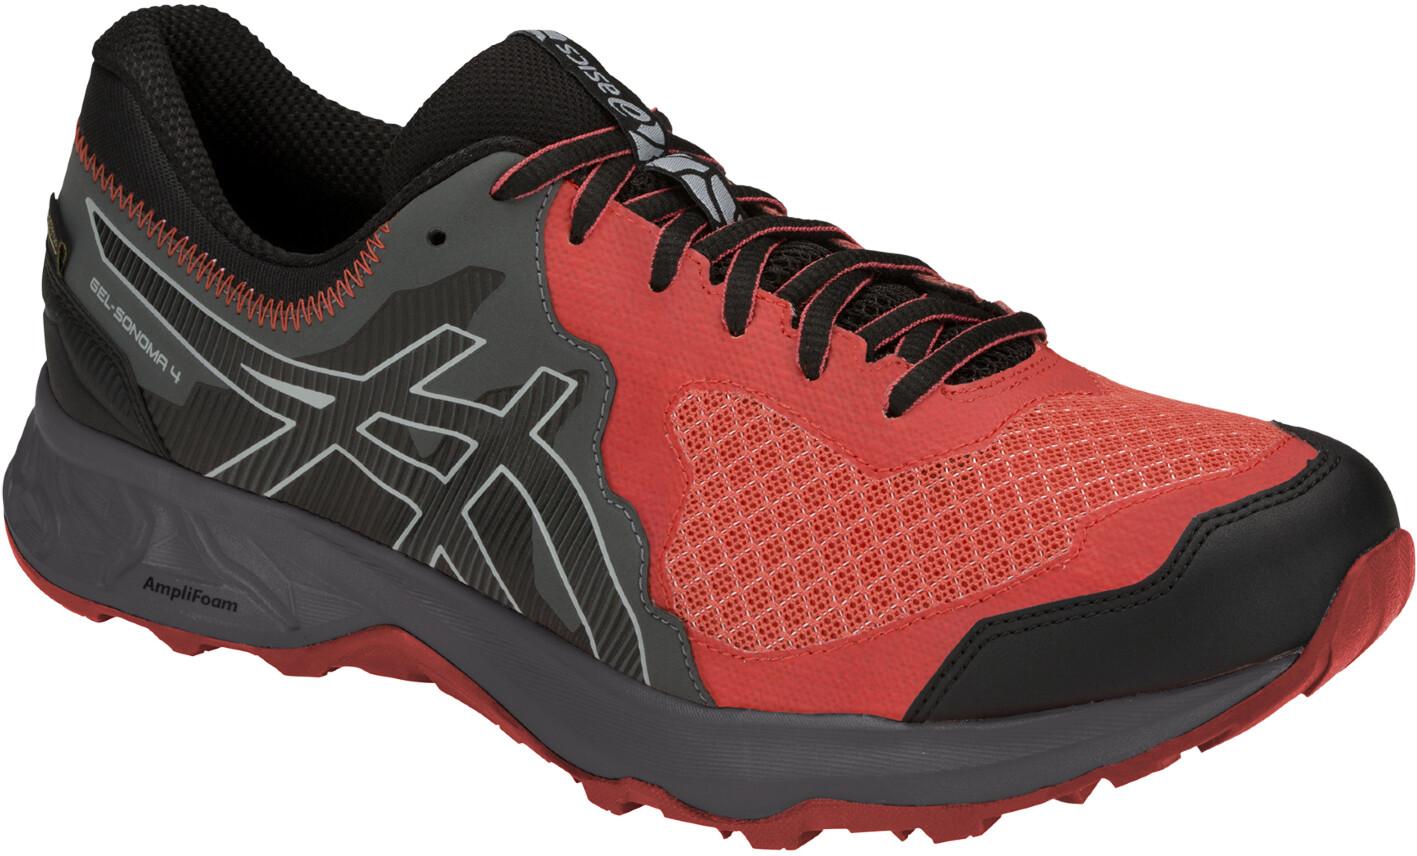 asics Gel-Sonoma 4 G-TX Sko Herrer, red snapper/black (2019)   Shoes and overlays